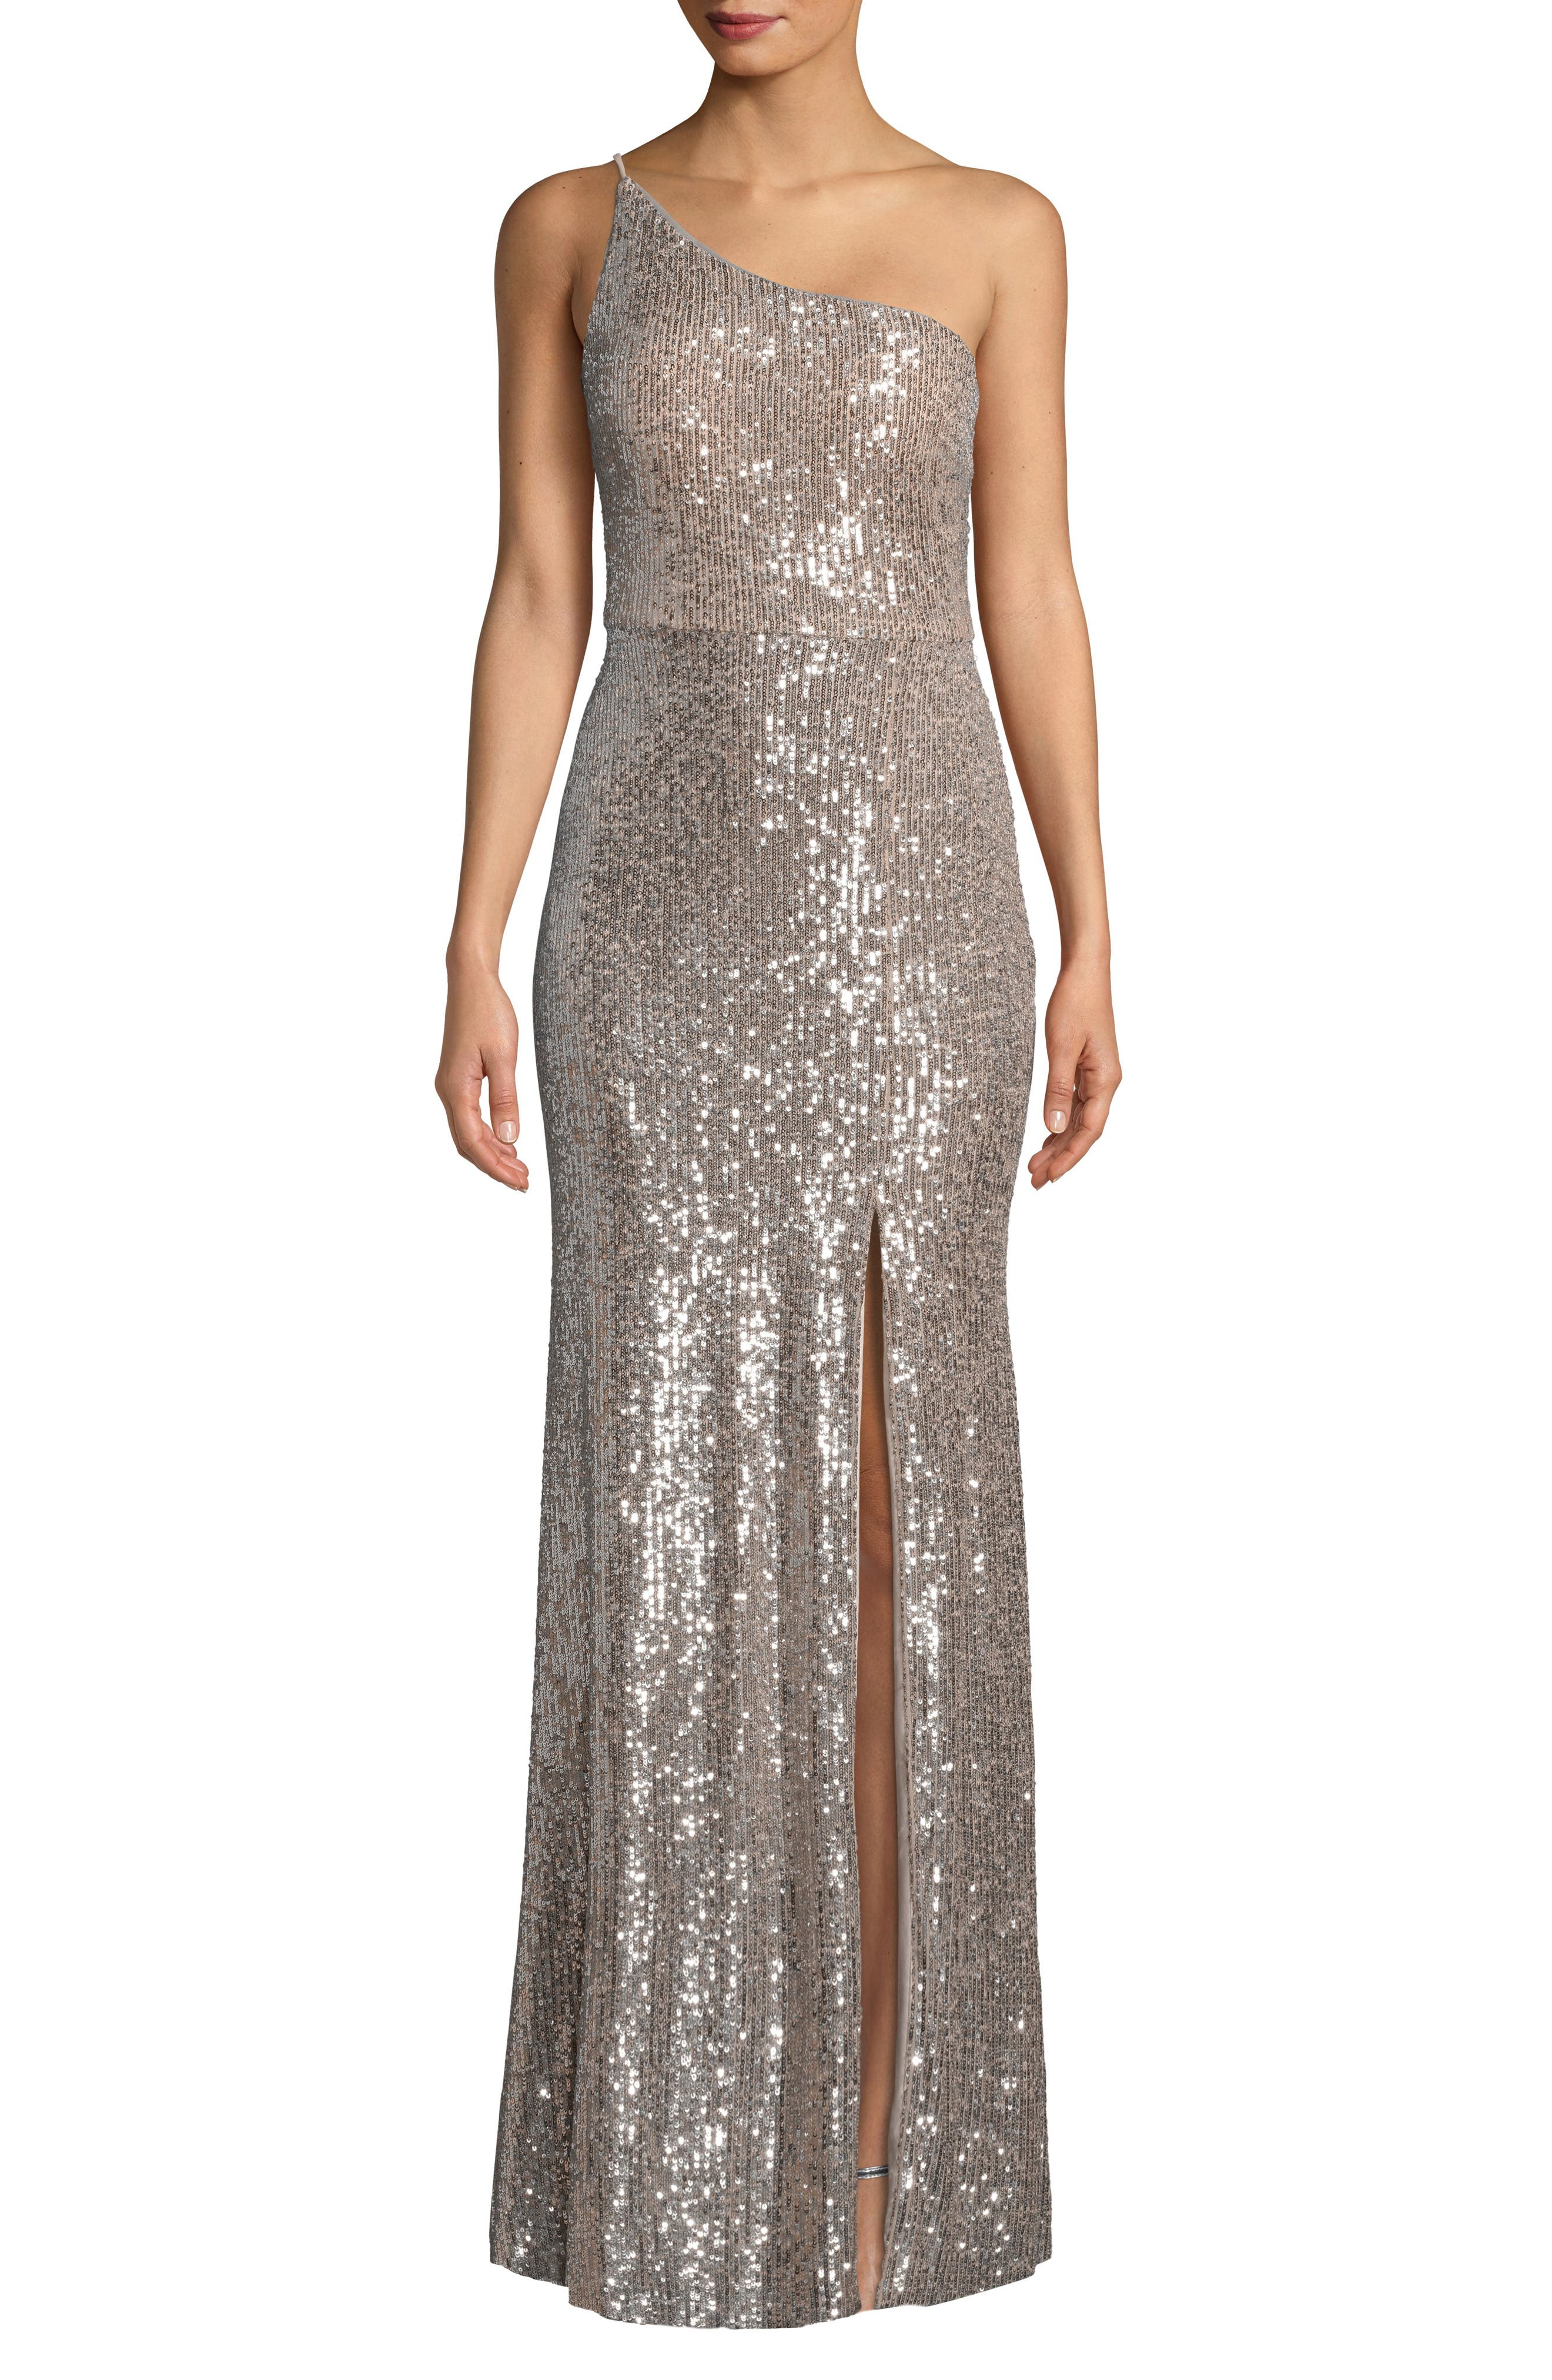 Xscape One Shoulder Sequin Evening Dress, Beige